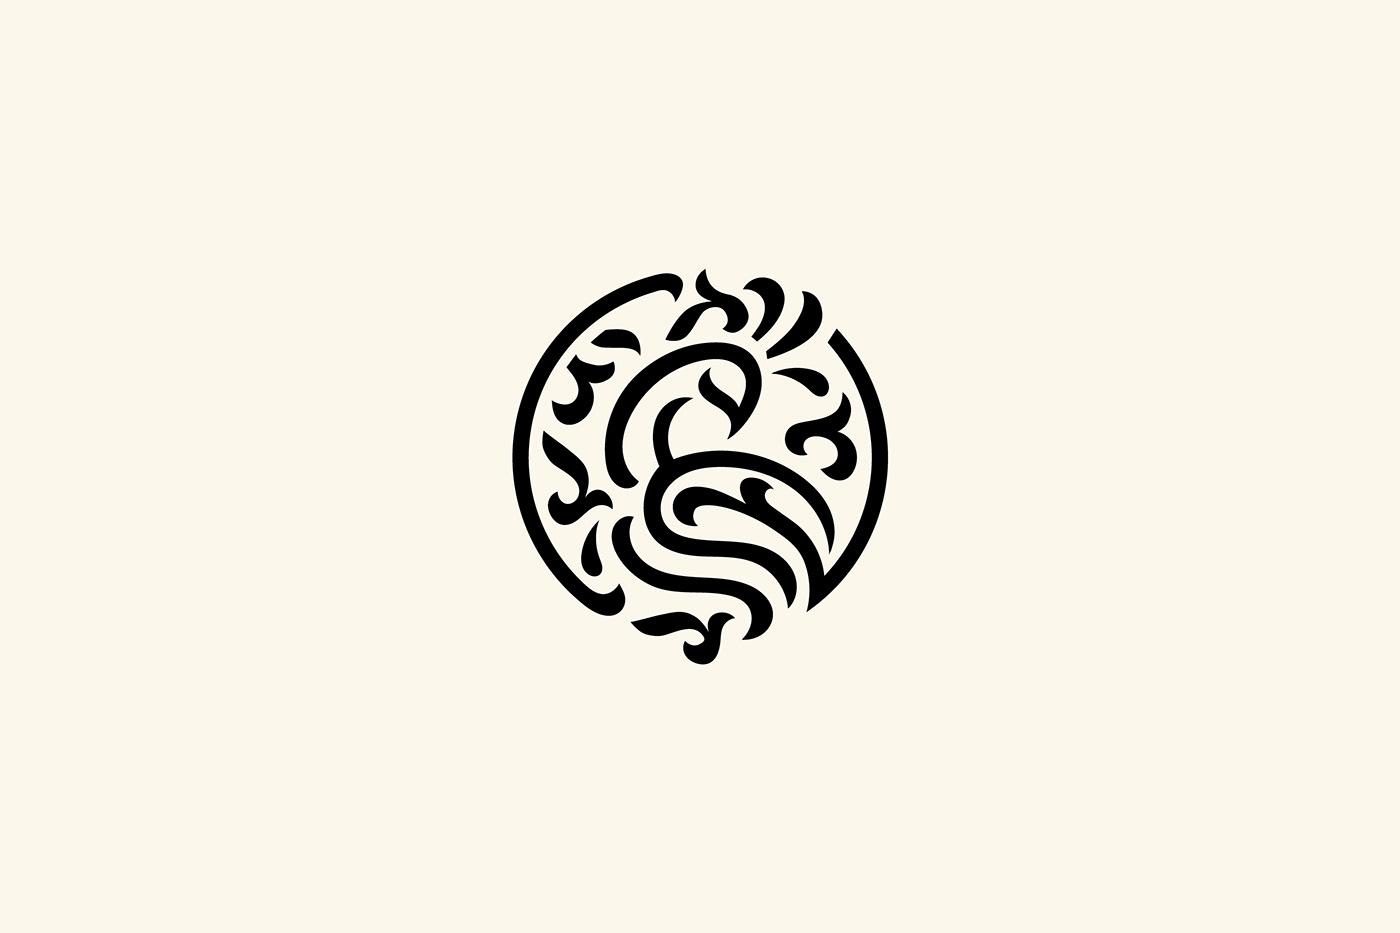 brand branding  Clothing elegant Fashion  identity logo Logotype luxury peacock